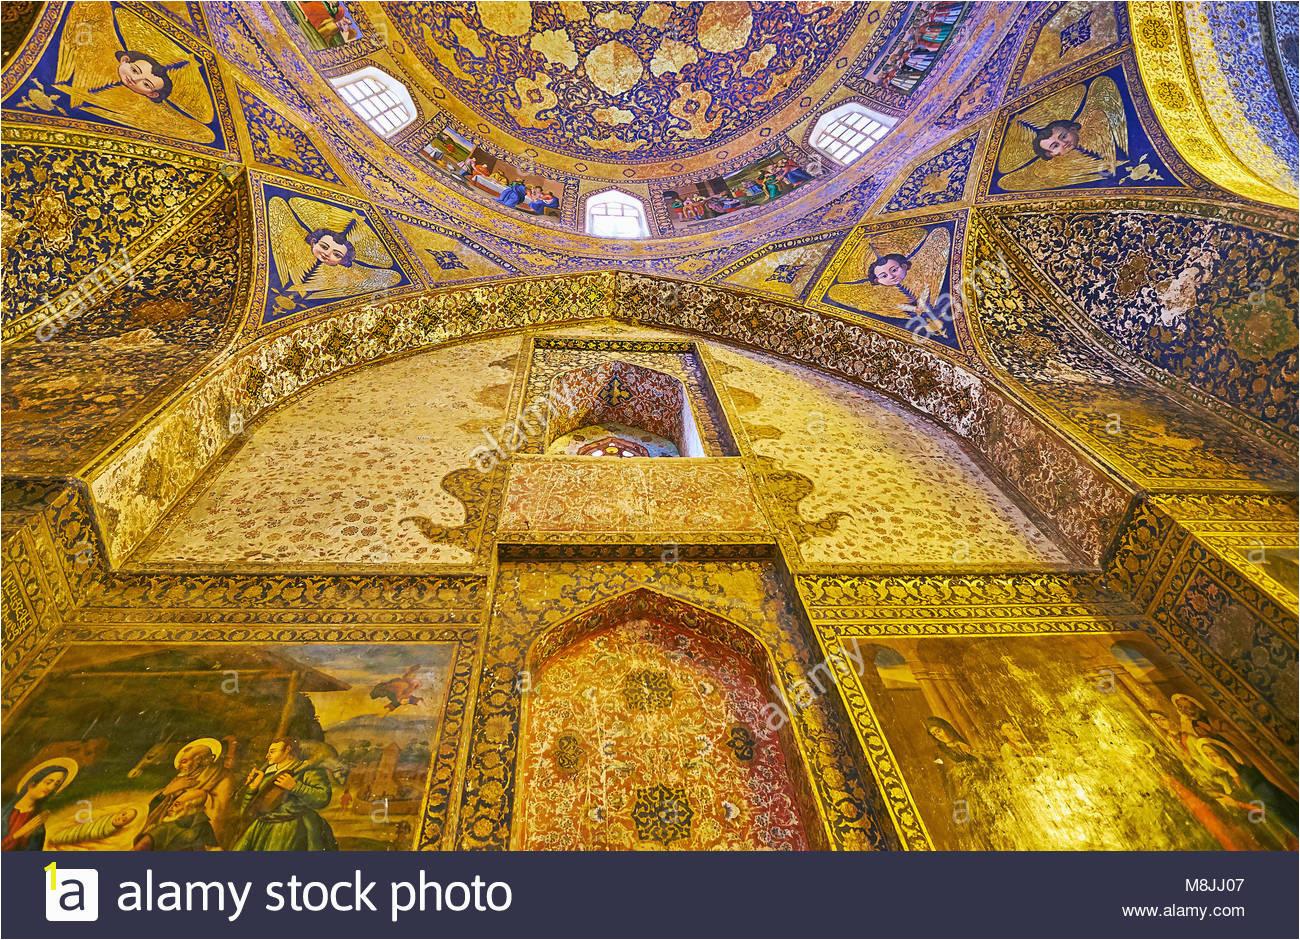 ISFAHAN IRAN OCTOBER 20 2017 The wall of Armenian Orthodox Bethlehem Church